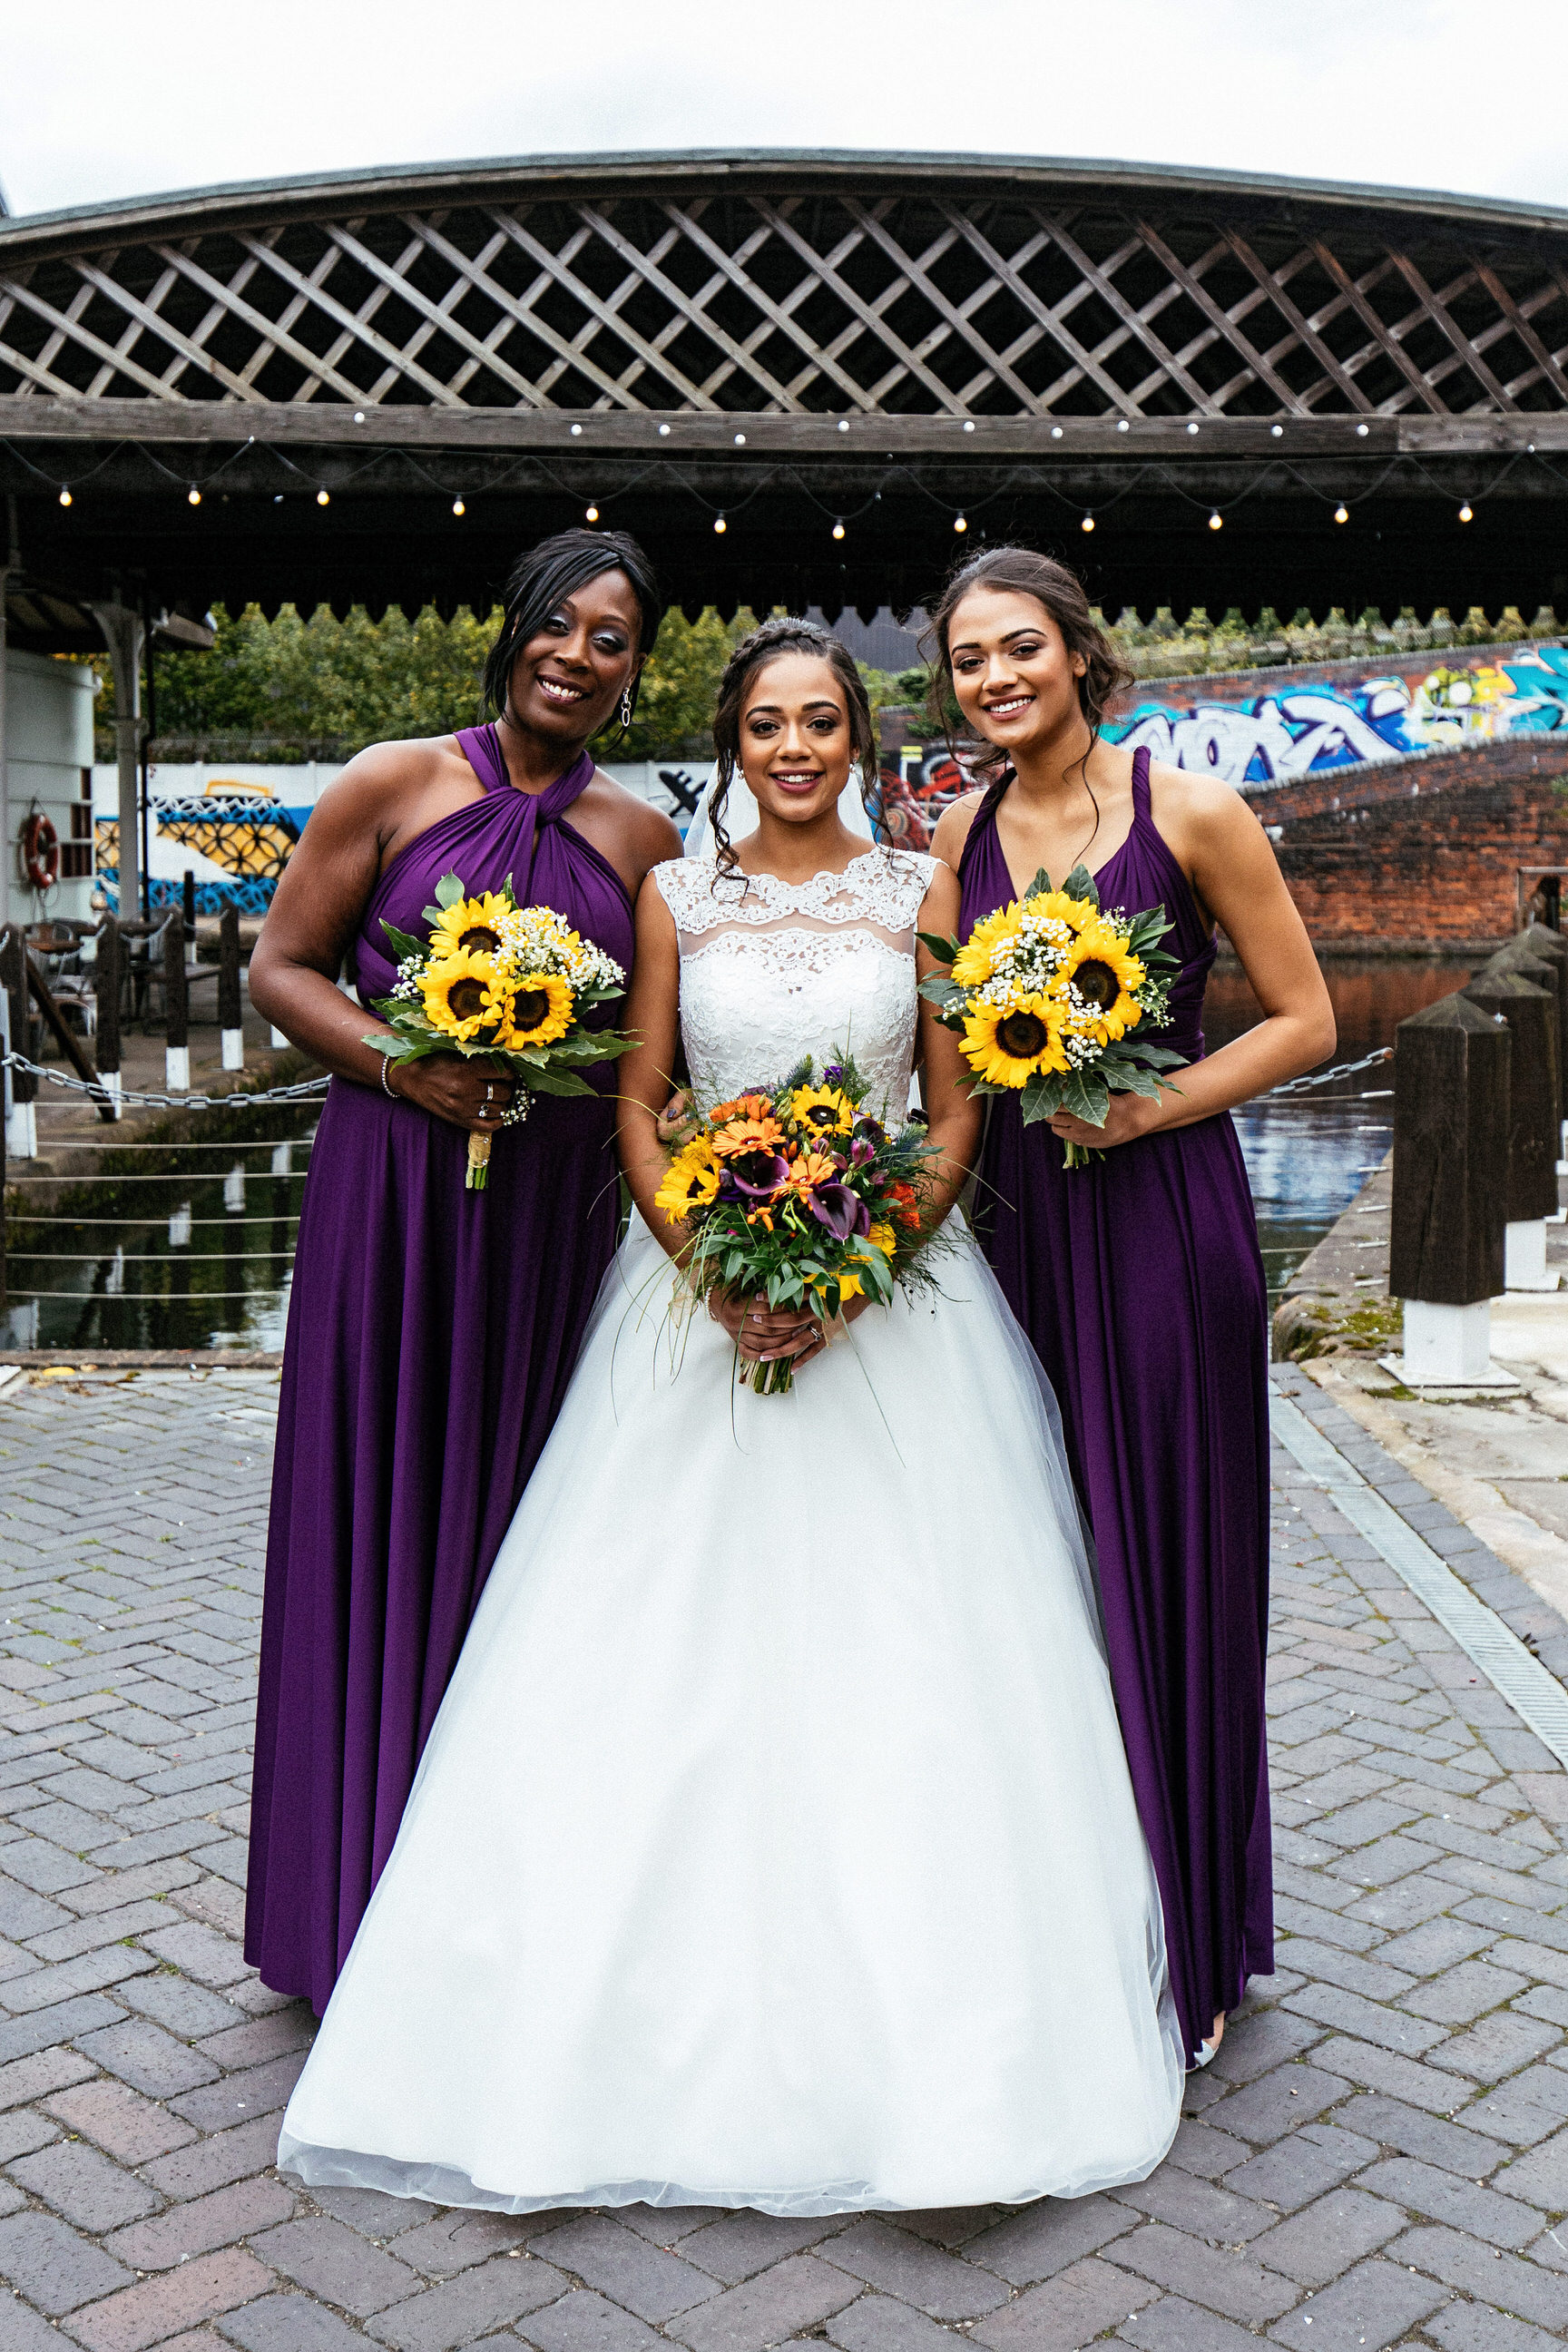 The-Bond-Company-Wedding-Photography-56-1.jpg